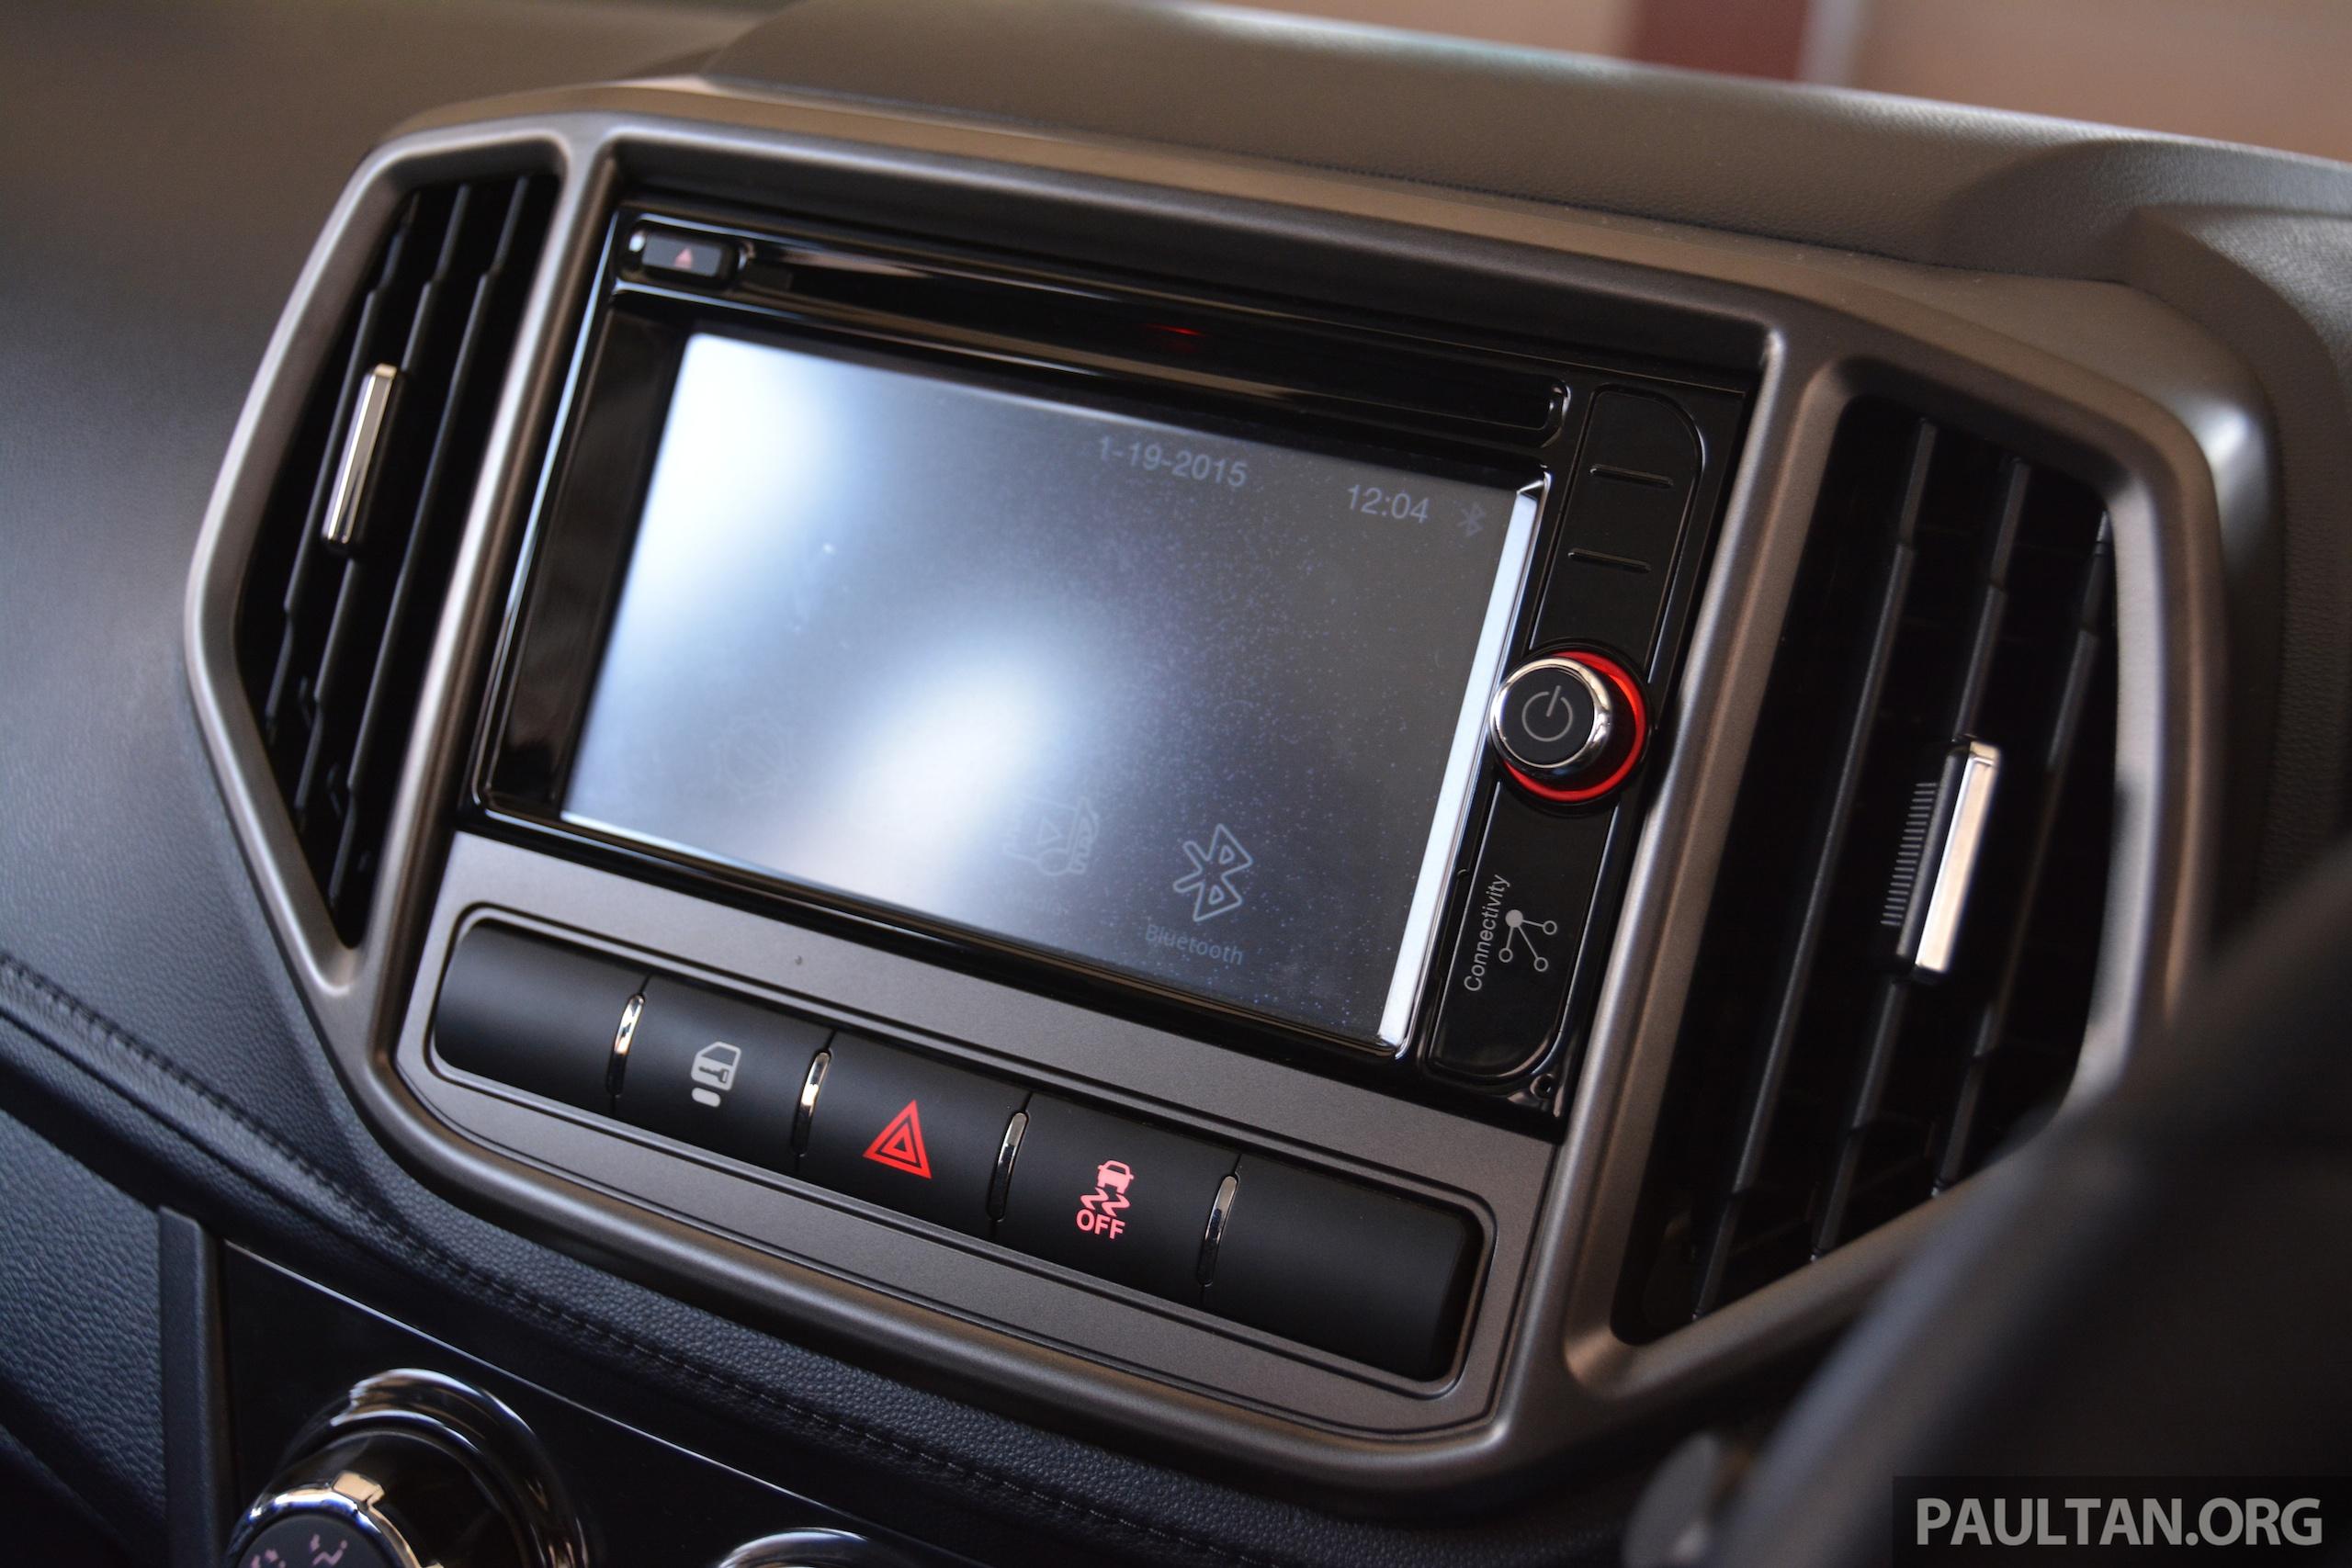 GALLERY: 2015 Perodua Myvi facelift vs Proton Iriz Paul ...